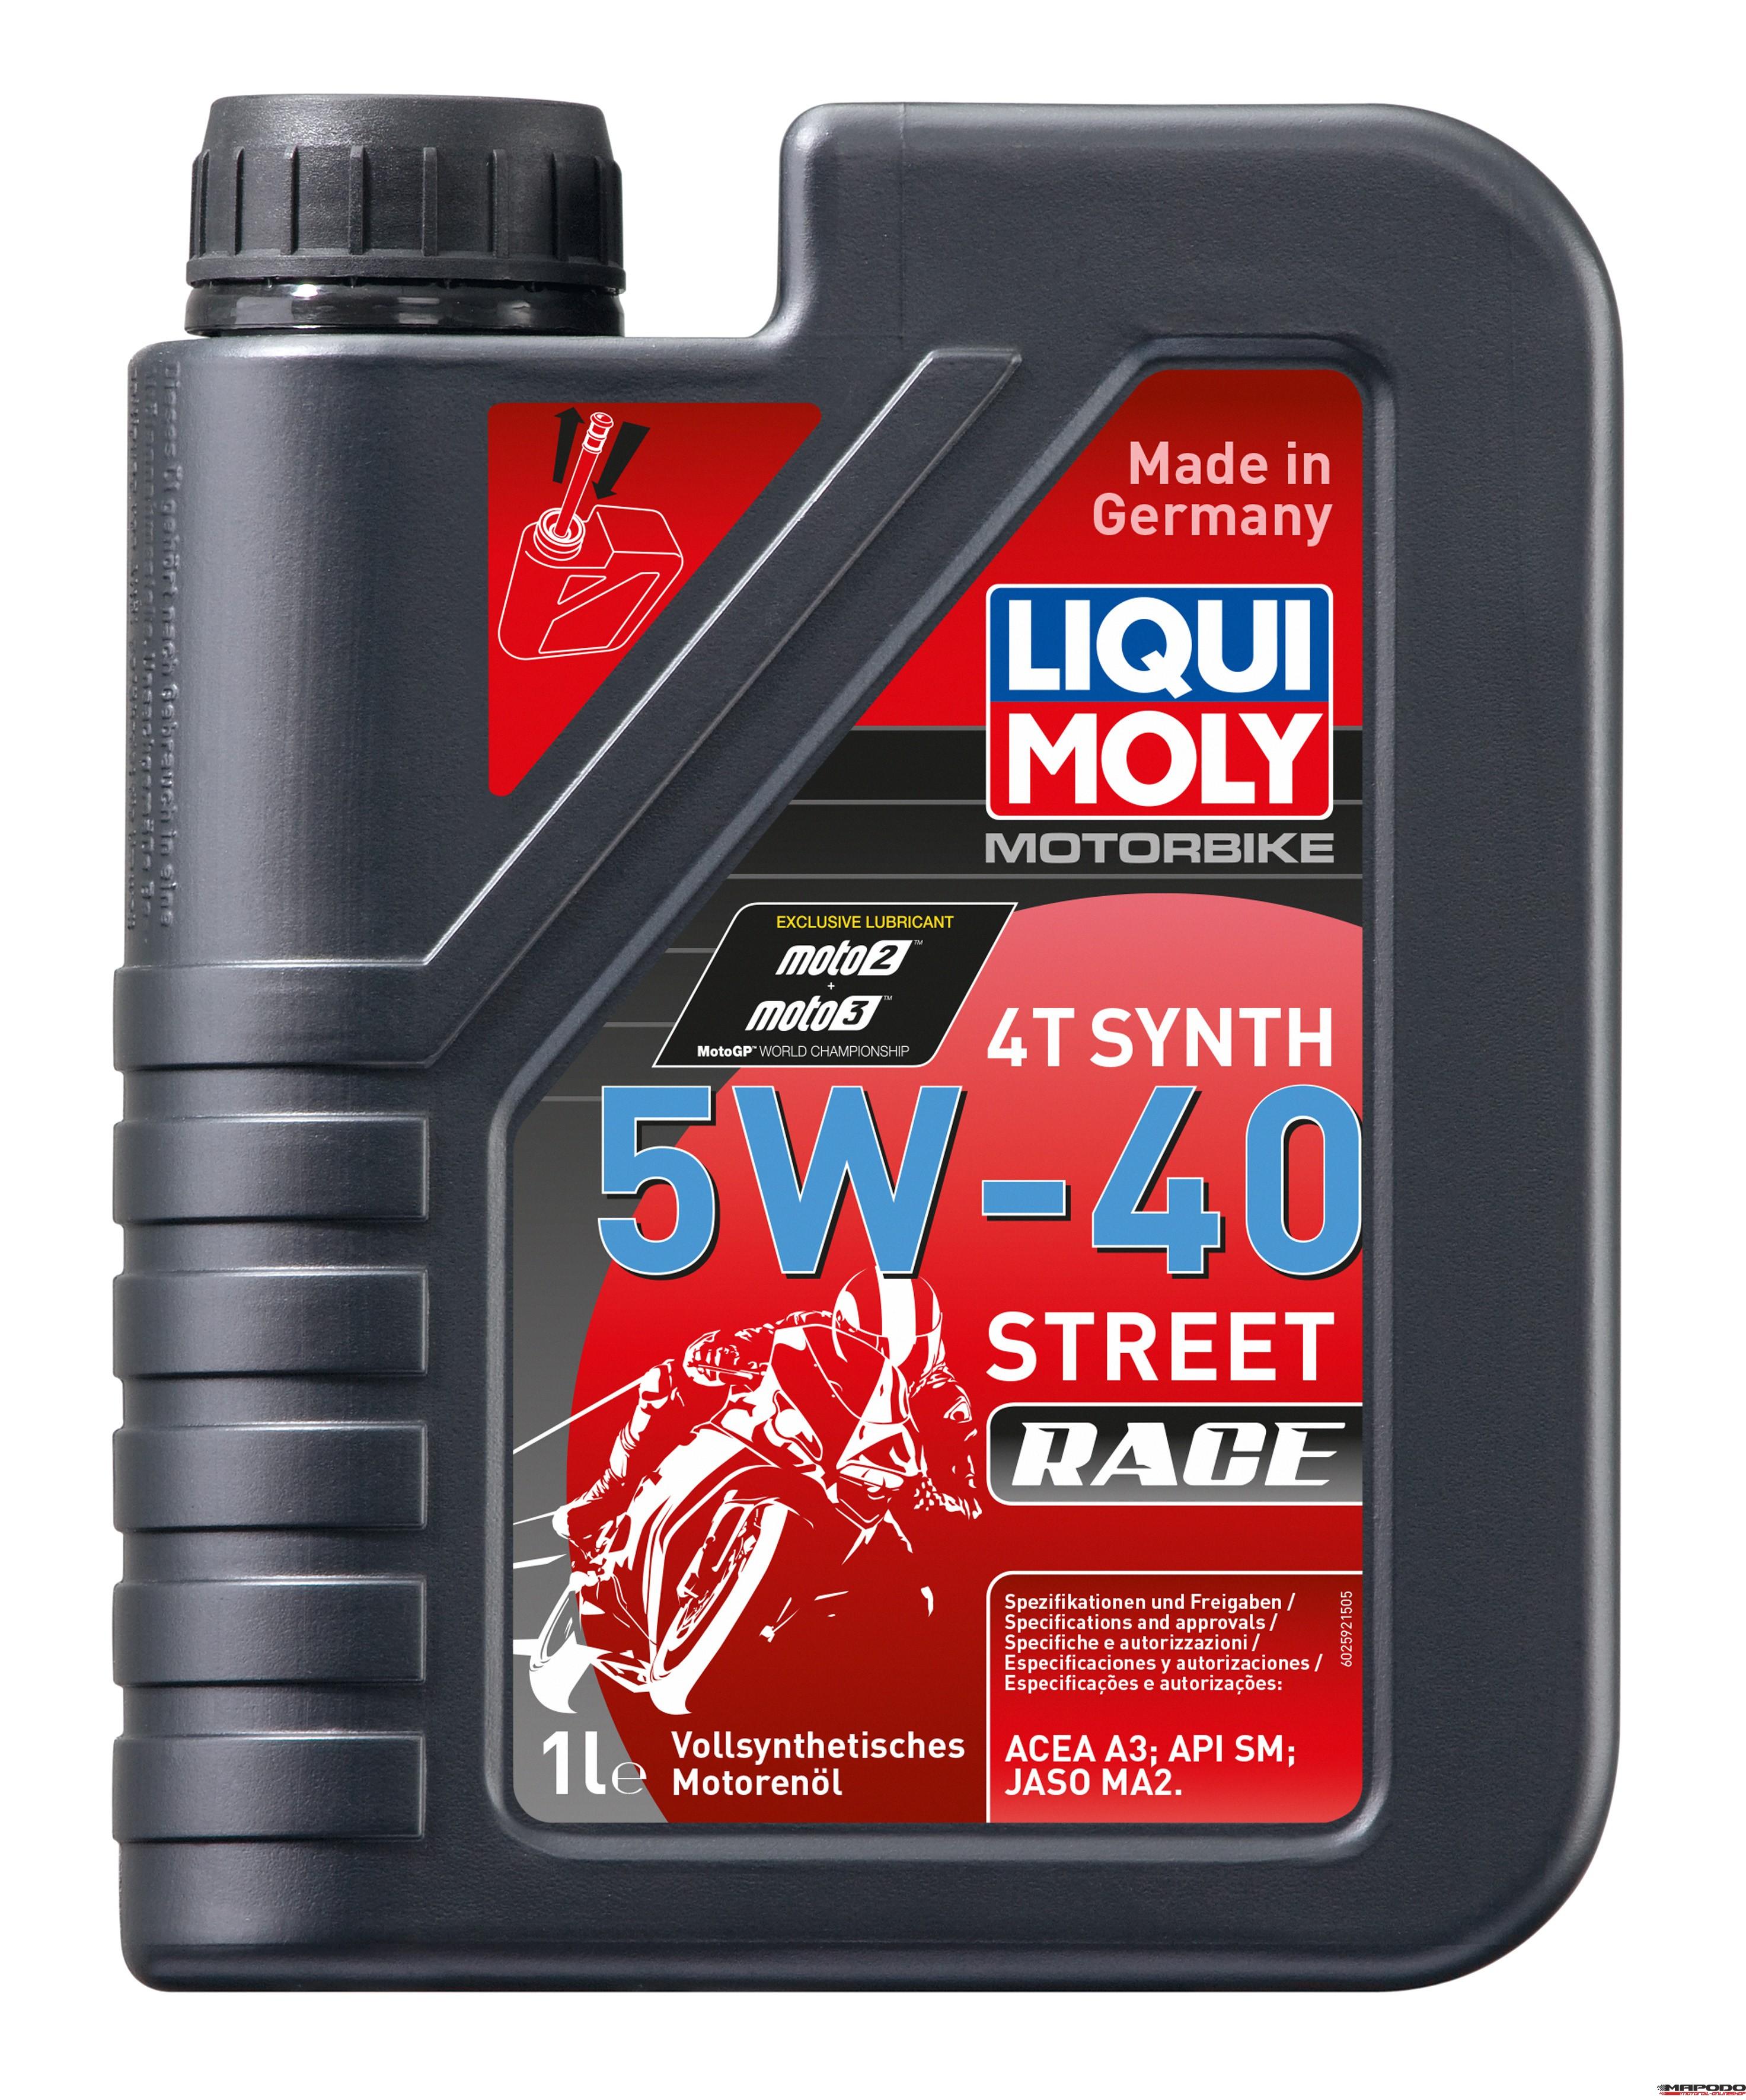 Liqui Moly 2592 Motorbike 4T Synth 5W-40 Street Race 1L